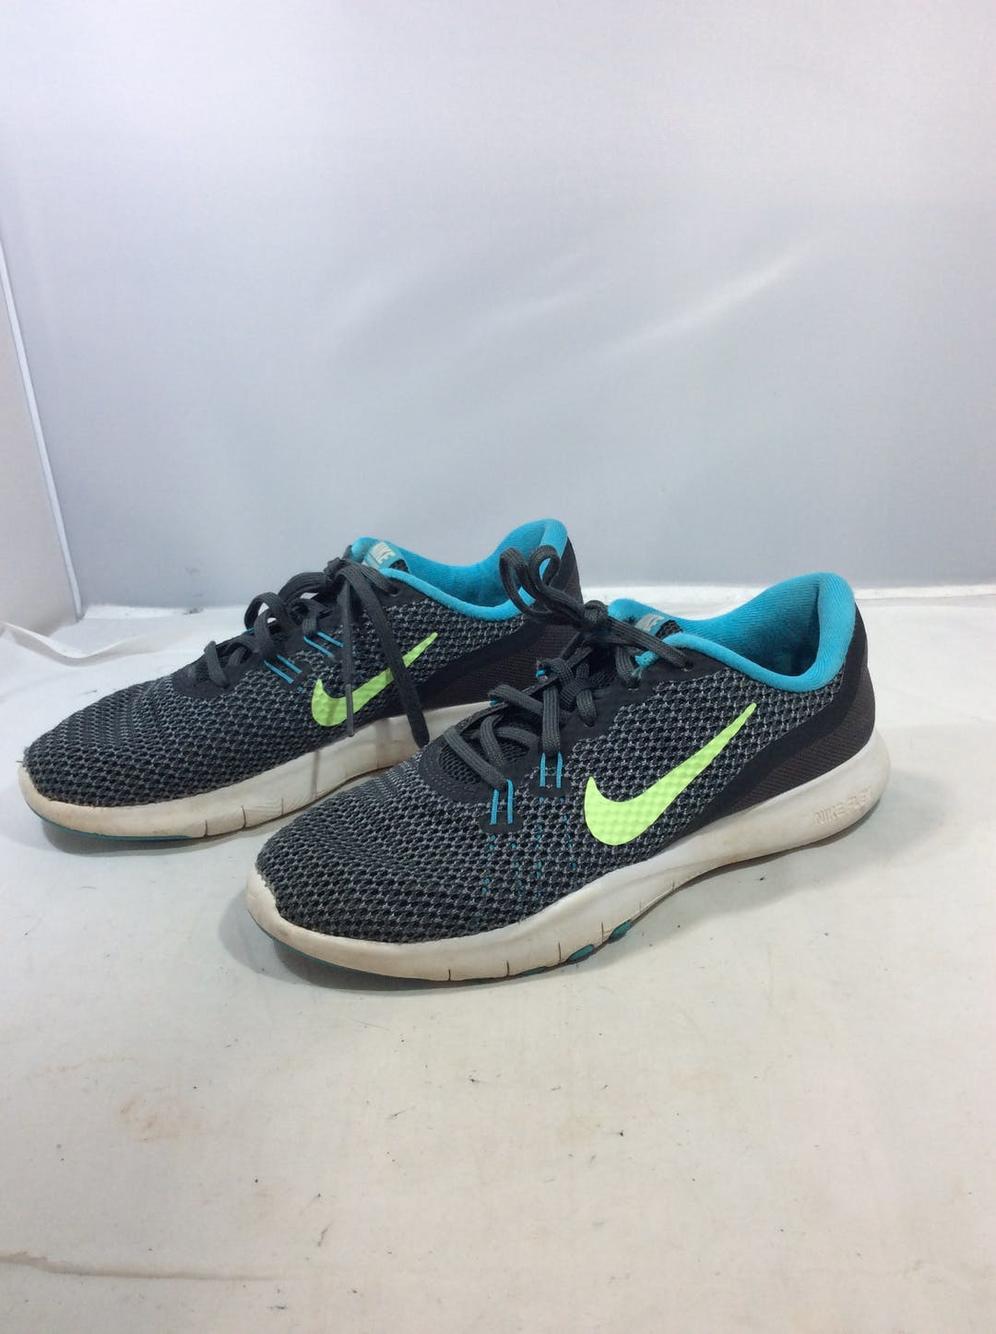 Nike Used Flex Tr7 Senior 6 Running